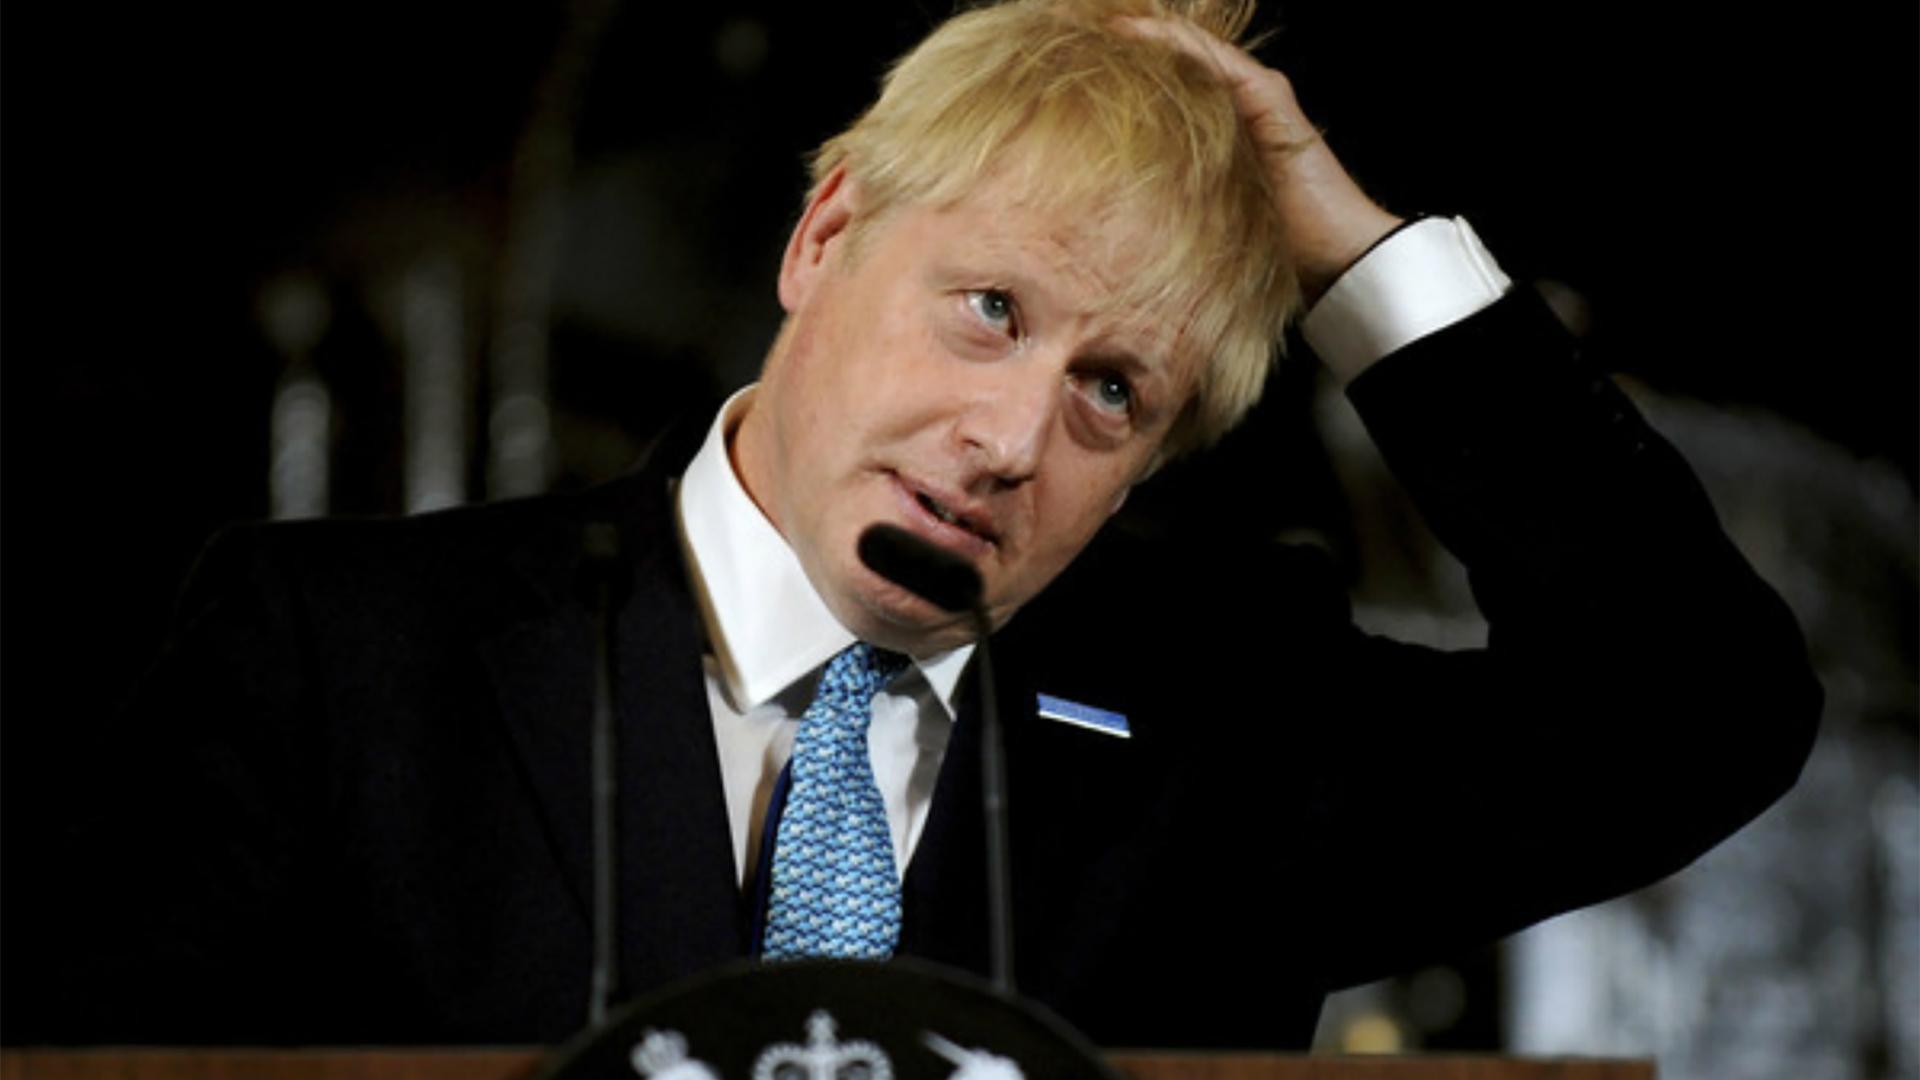 Boris must announce the final destination – with no more diversions, u-turns, or cul-de-sacs